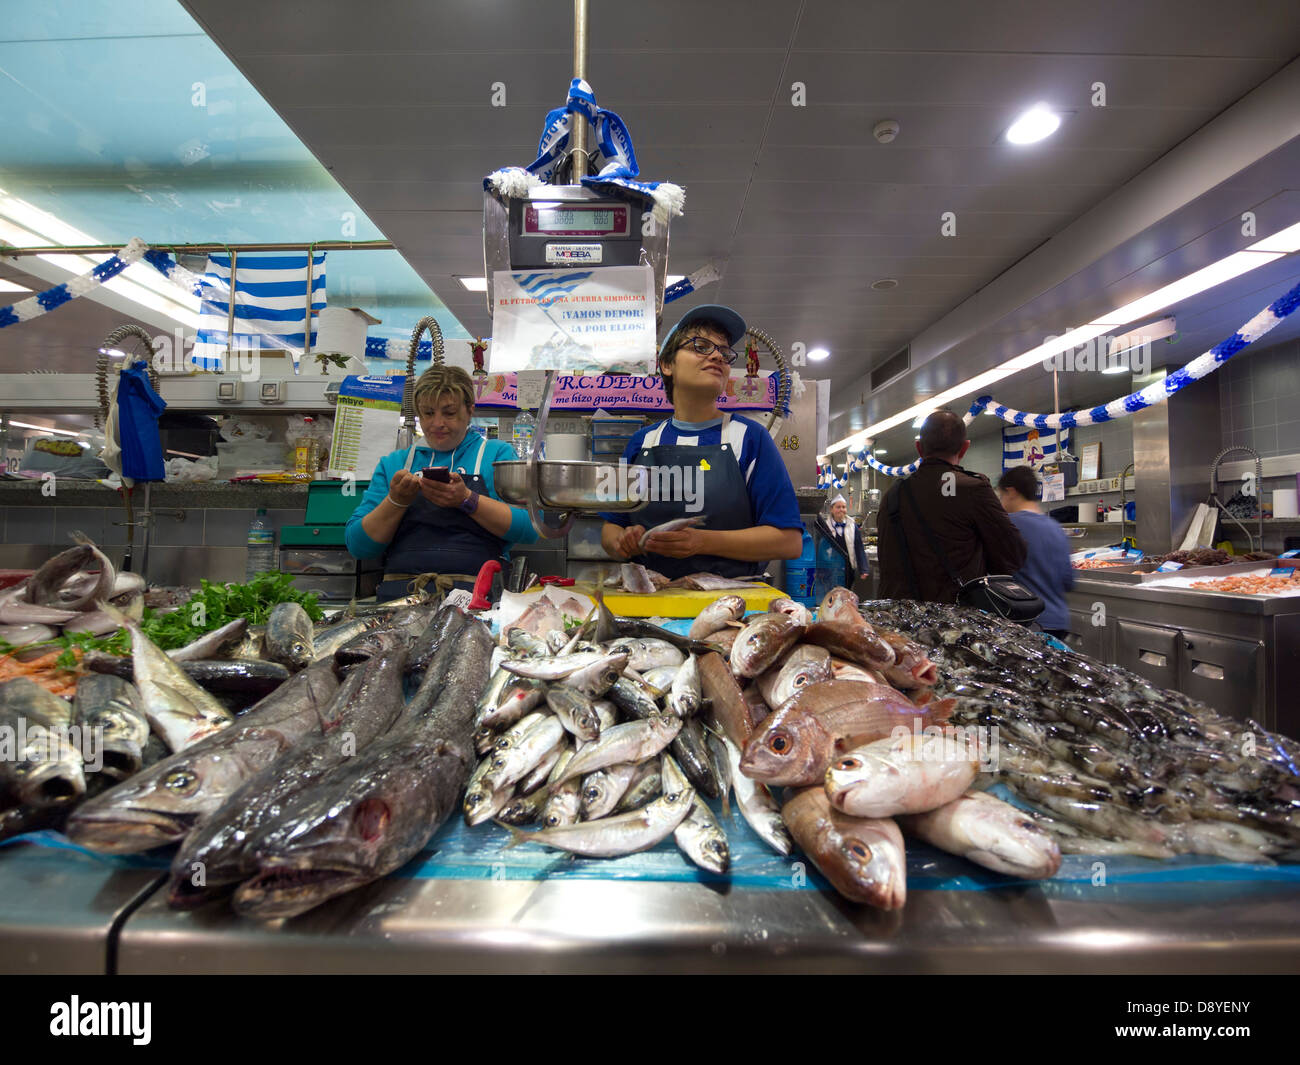 Fish market at the mercado de la plaza de lugo marketplace for La fish market